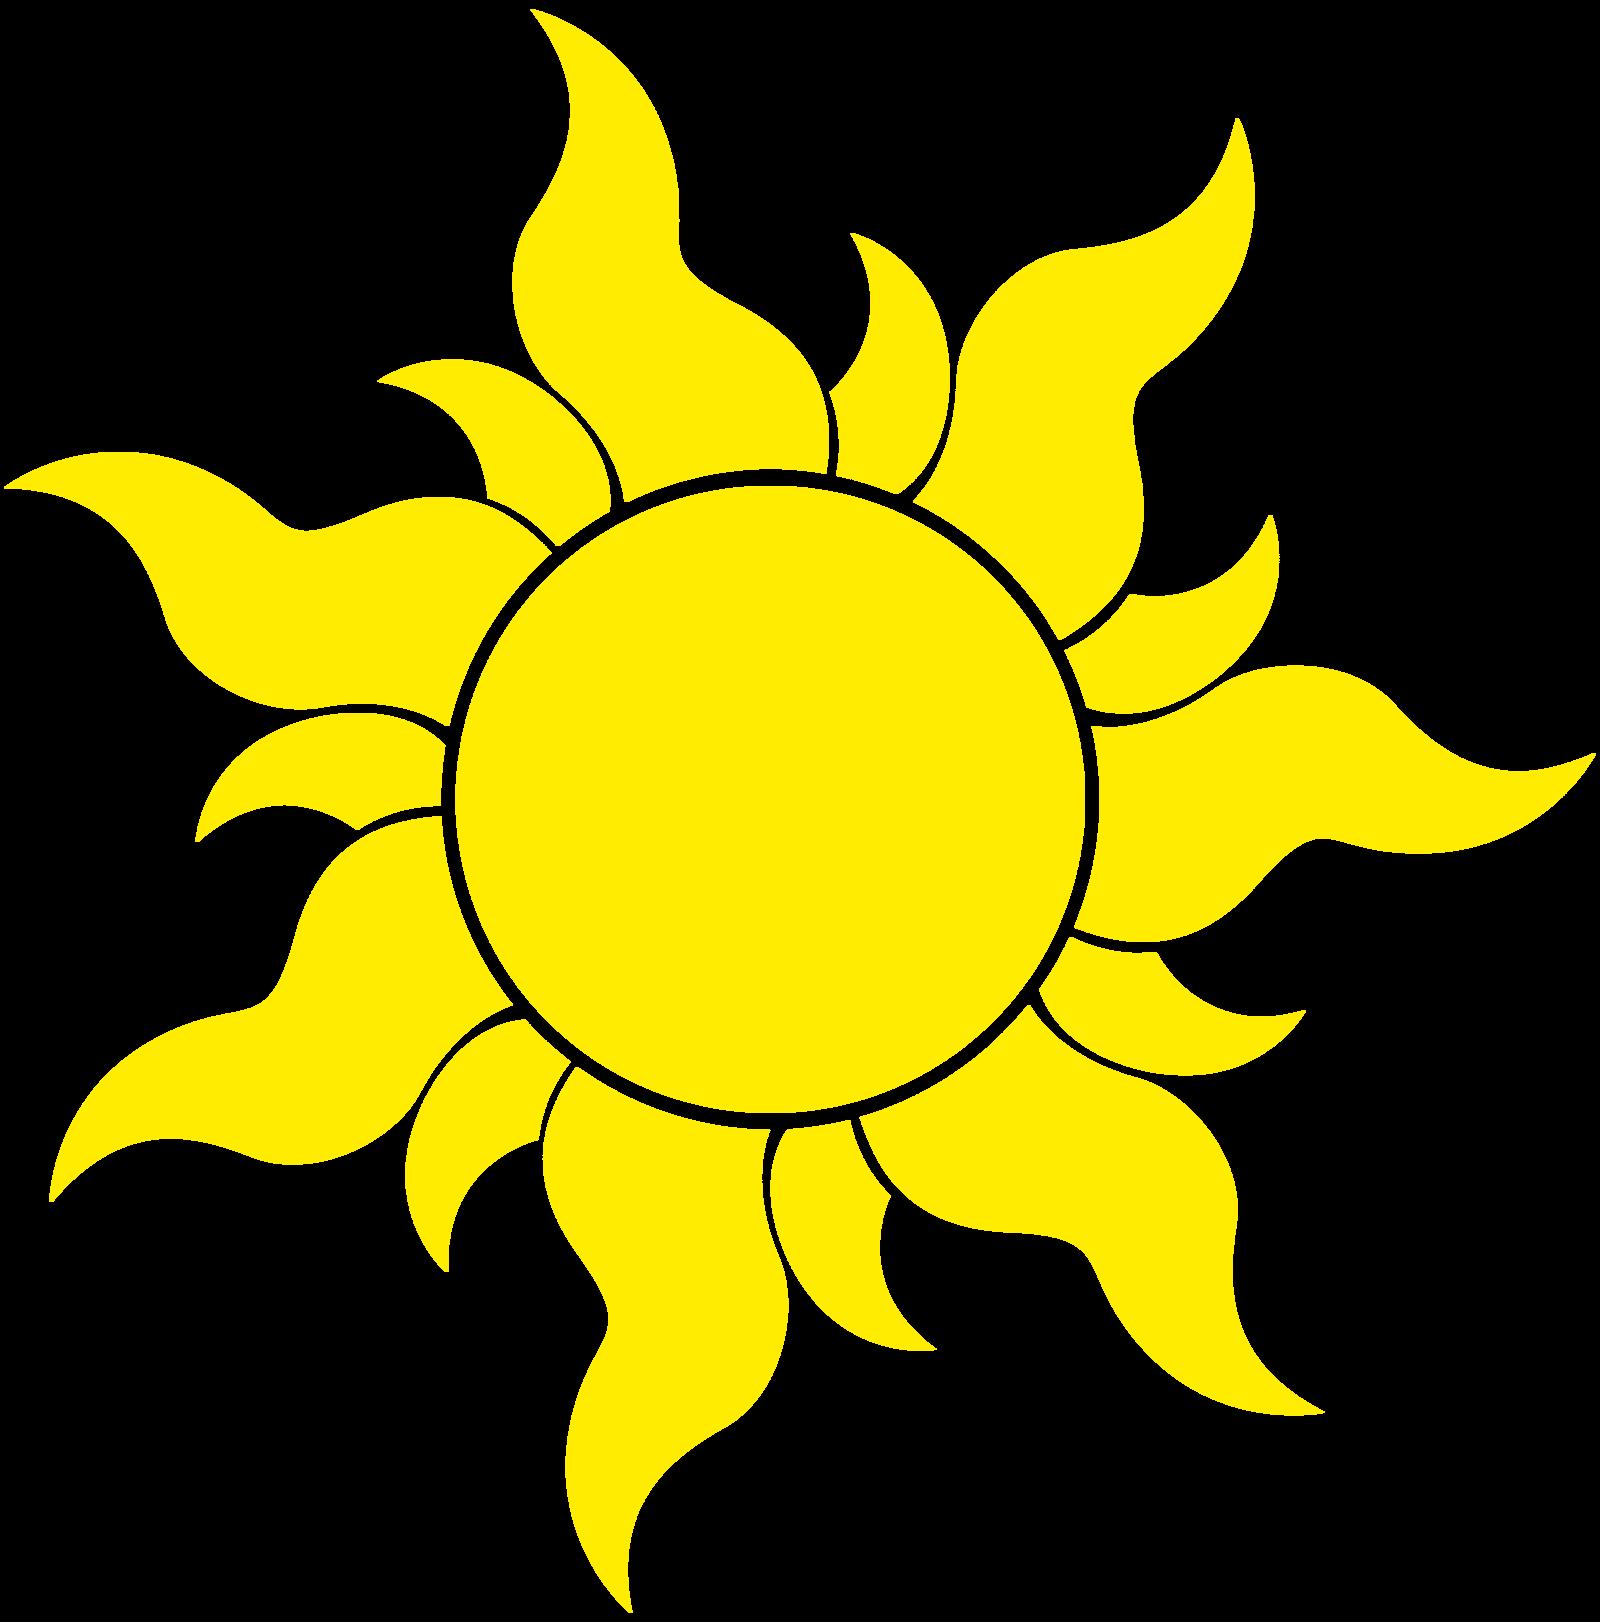 Tangled Sun Symbol Huge By Syntaxerror255 De Tangled Sun Sun Drawing Rapunzel Sun